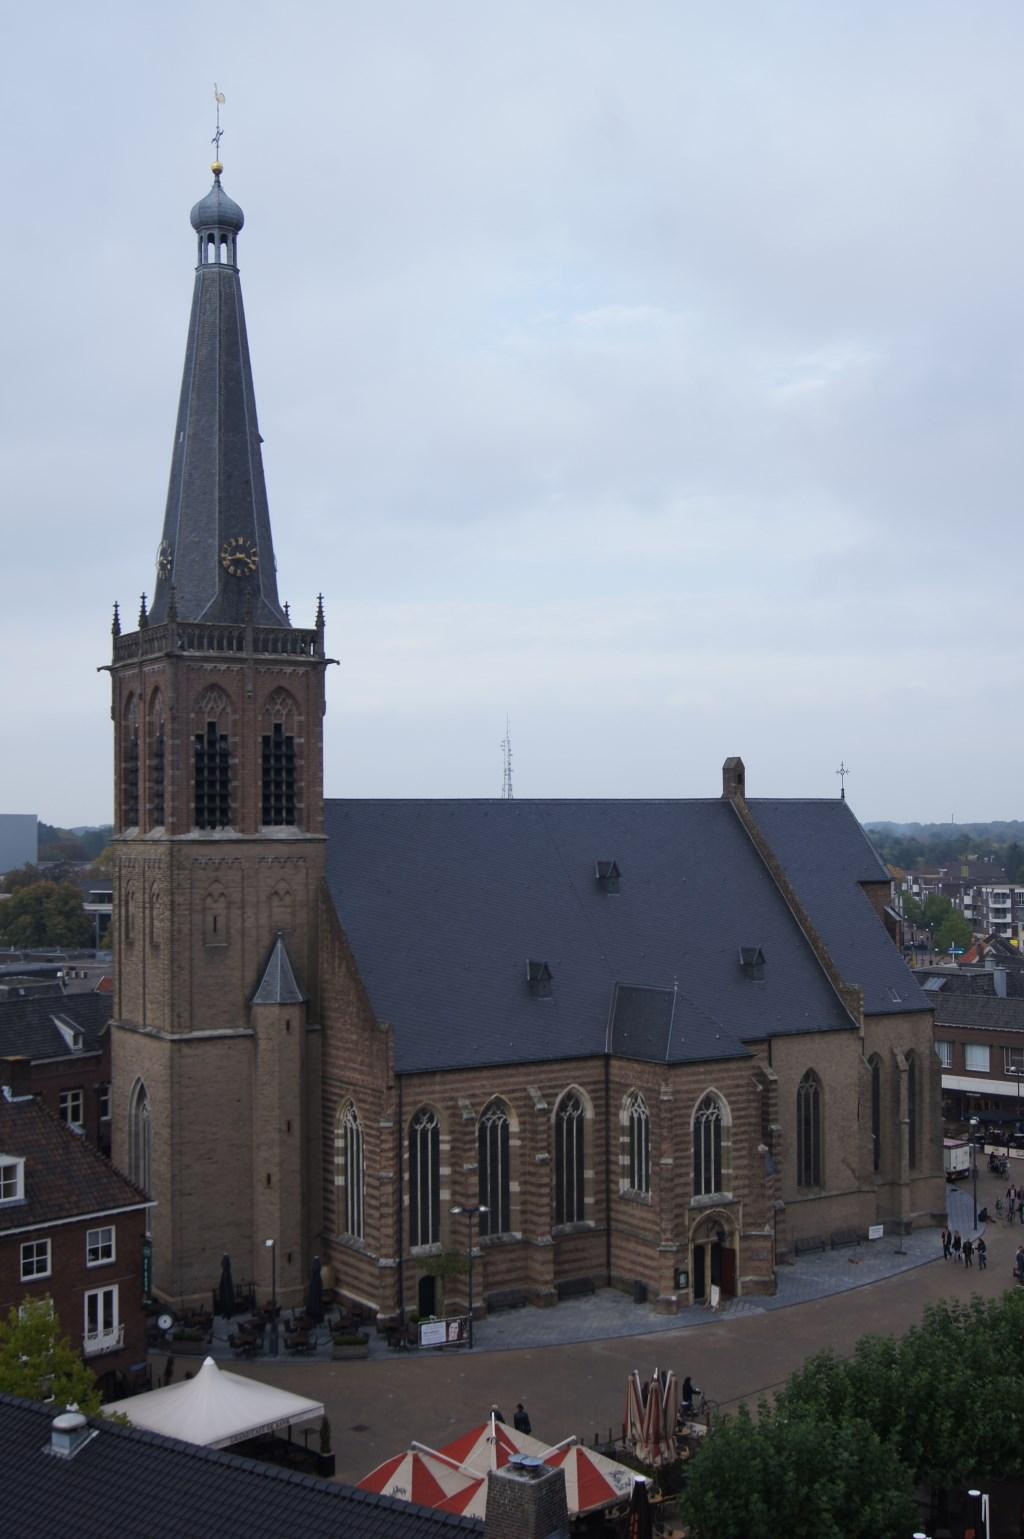 Catharinakerk Doetinchem Foto: Jan Kuiperij © DPG Media